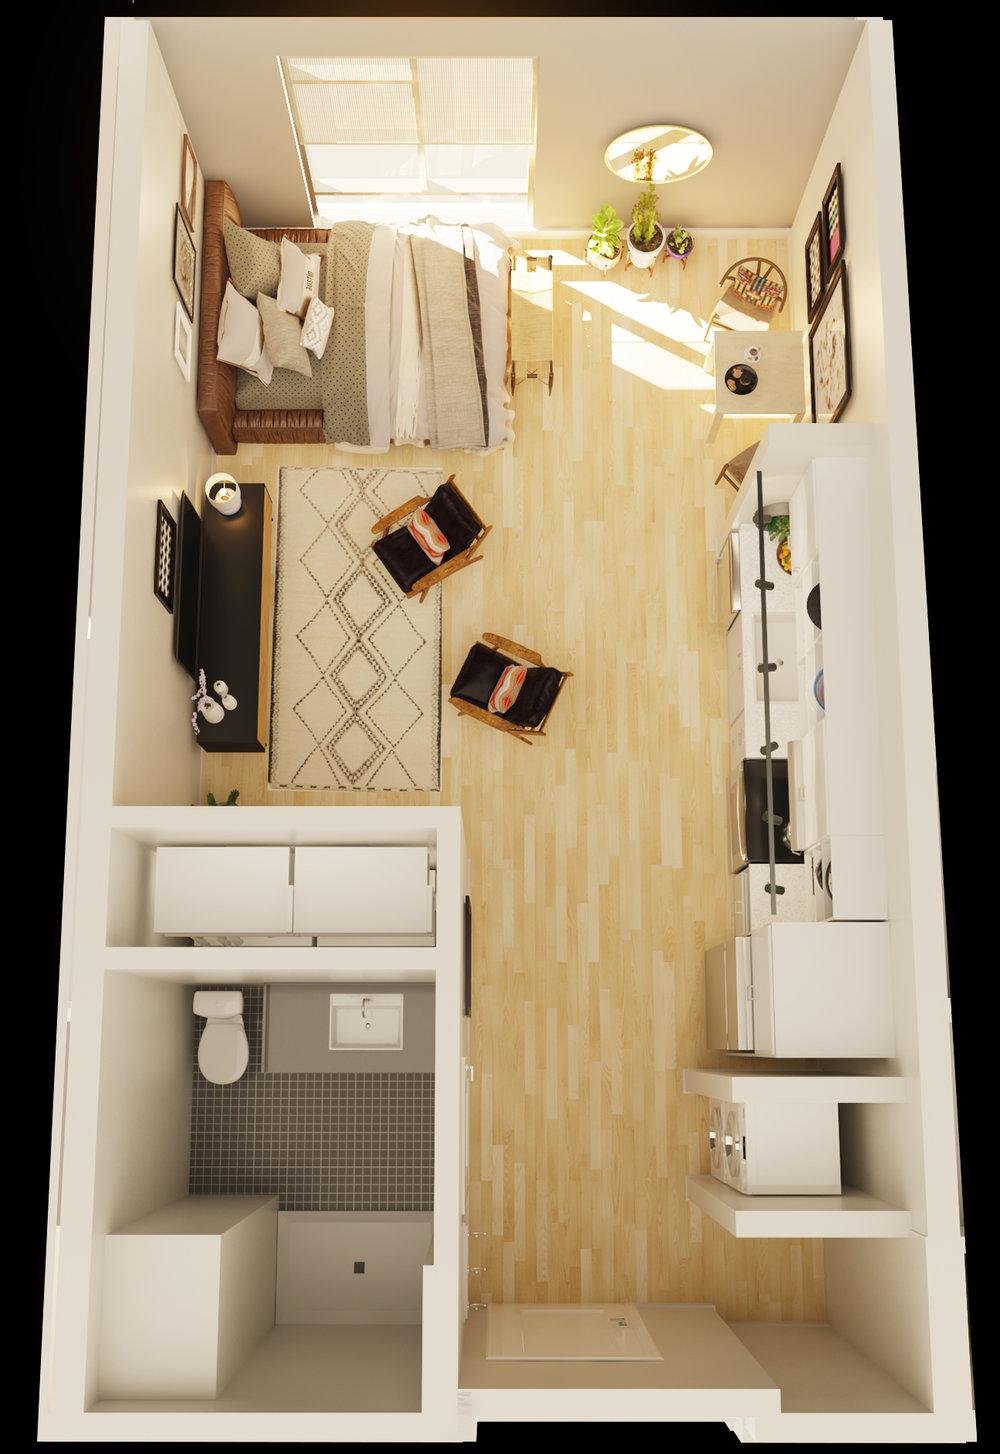 SAA_BA_Unit 810 3D Plan_V1_02.jpg